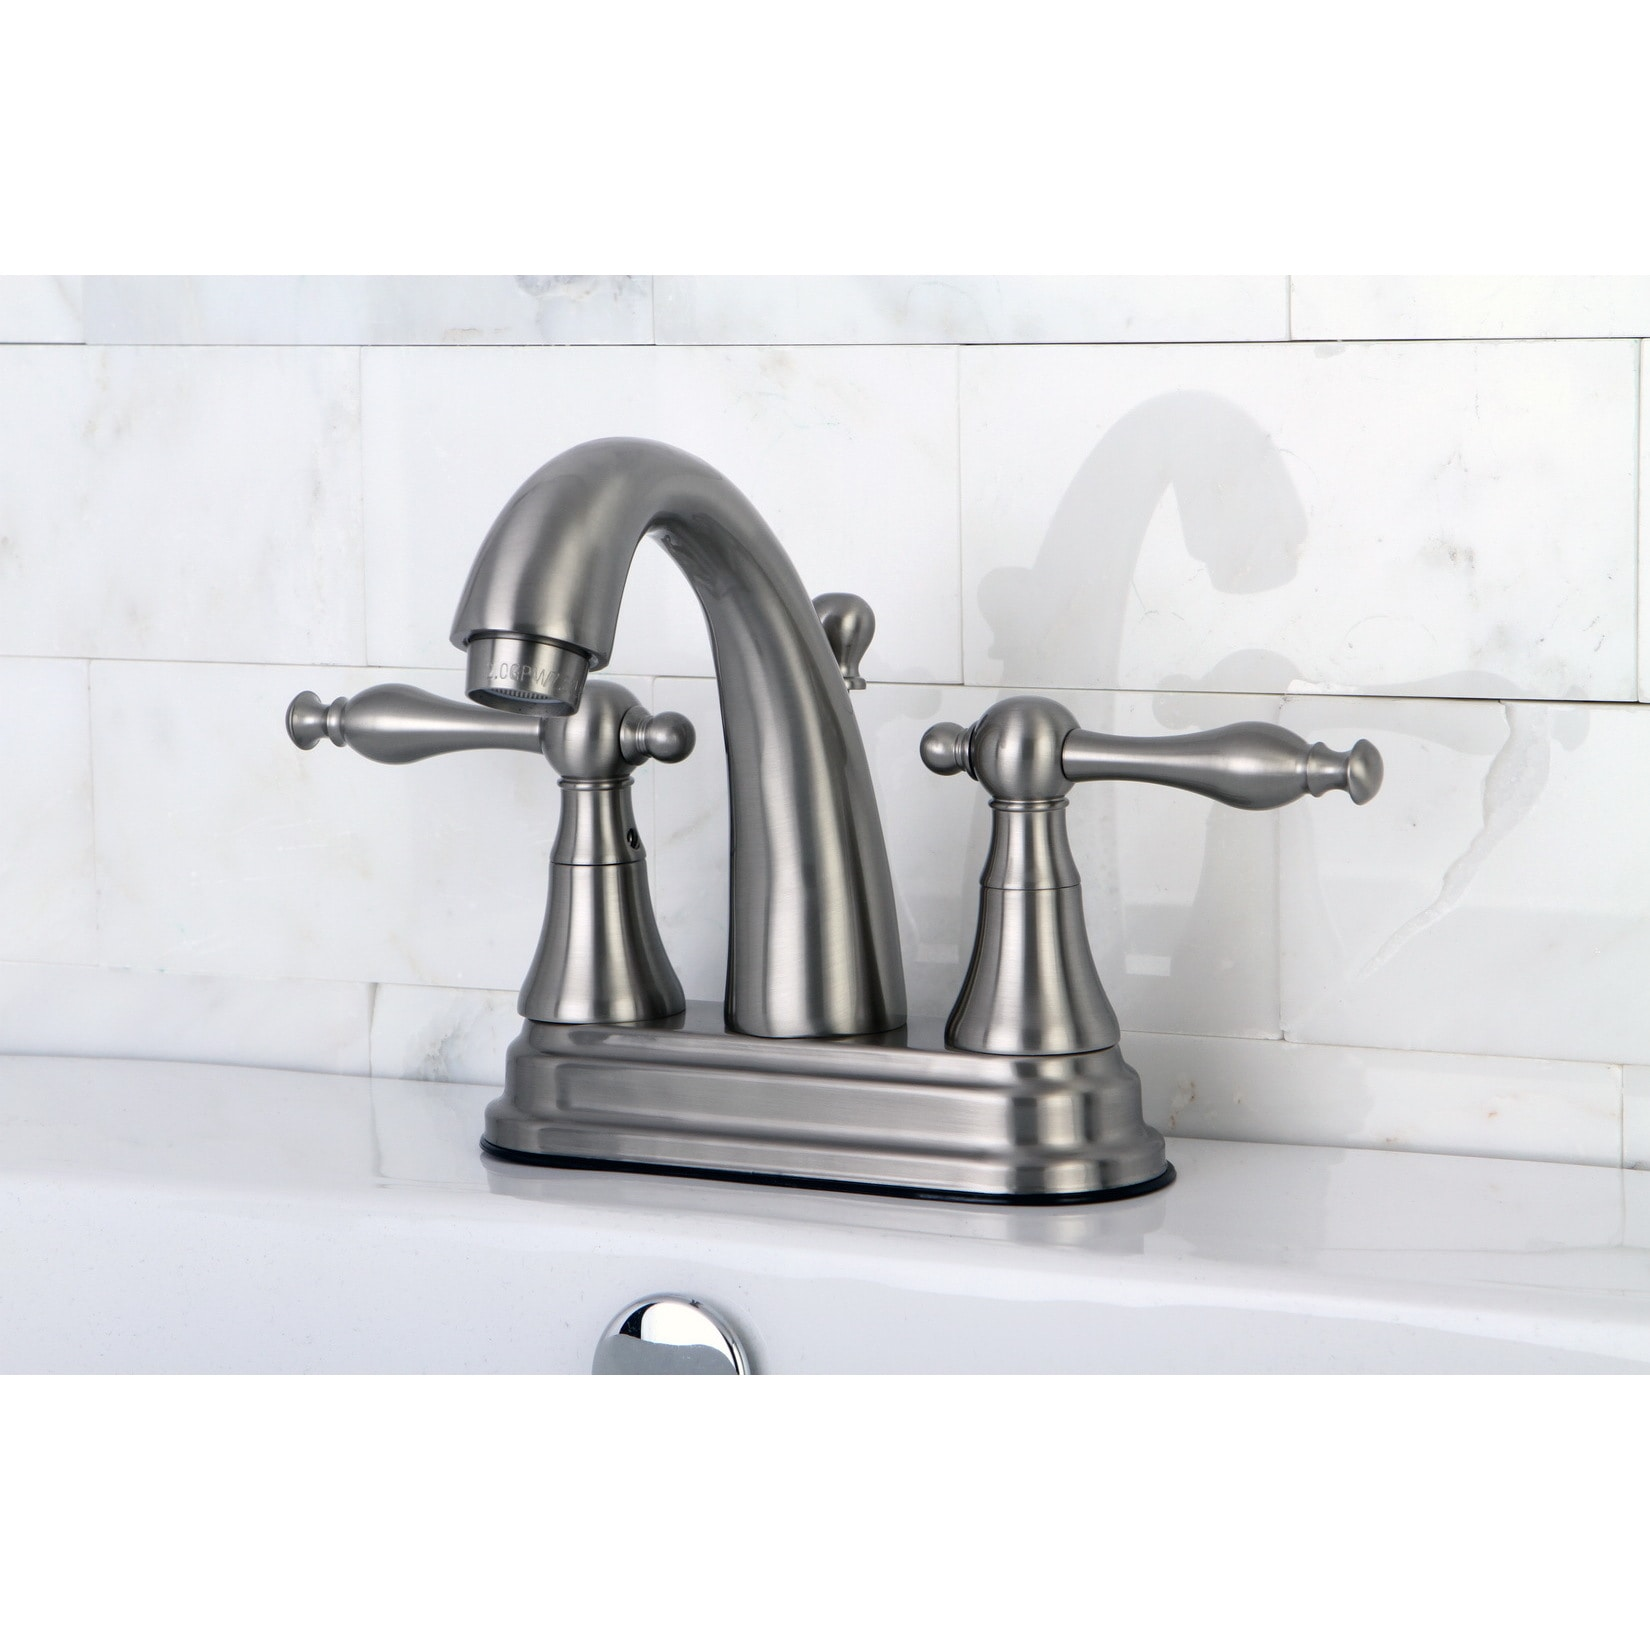 Overstock.com Classic Two-Handle Satin Nickel Bathroom Faucet